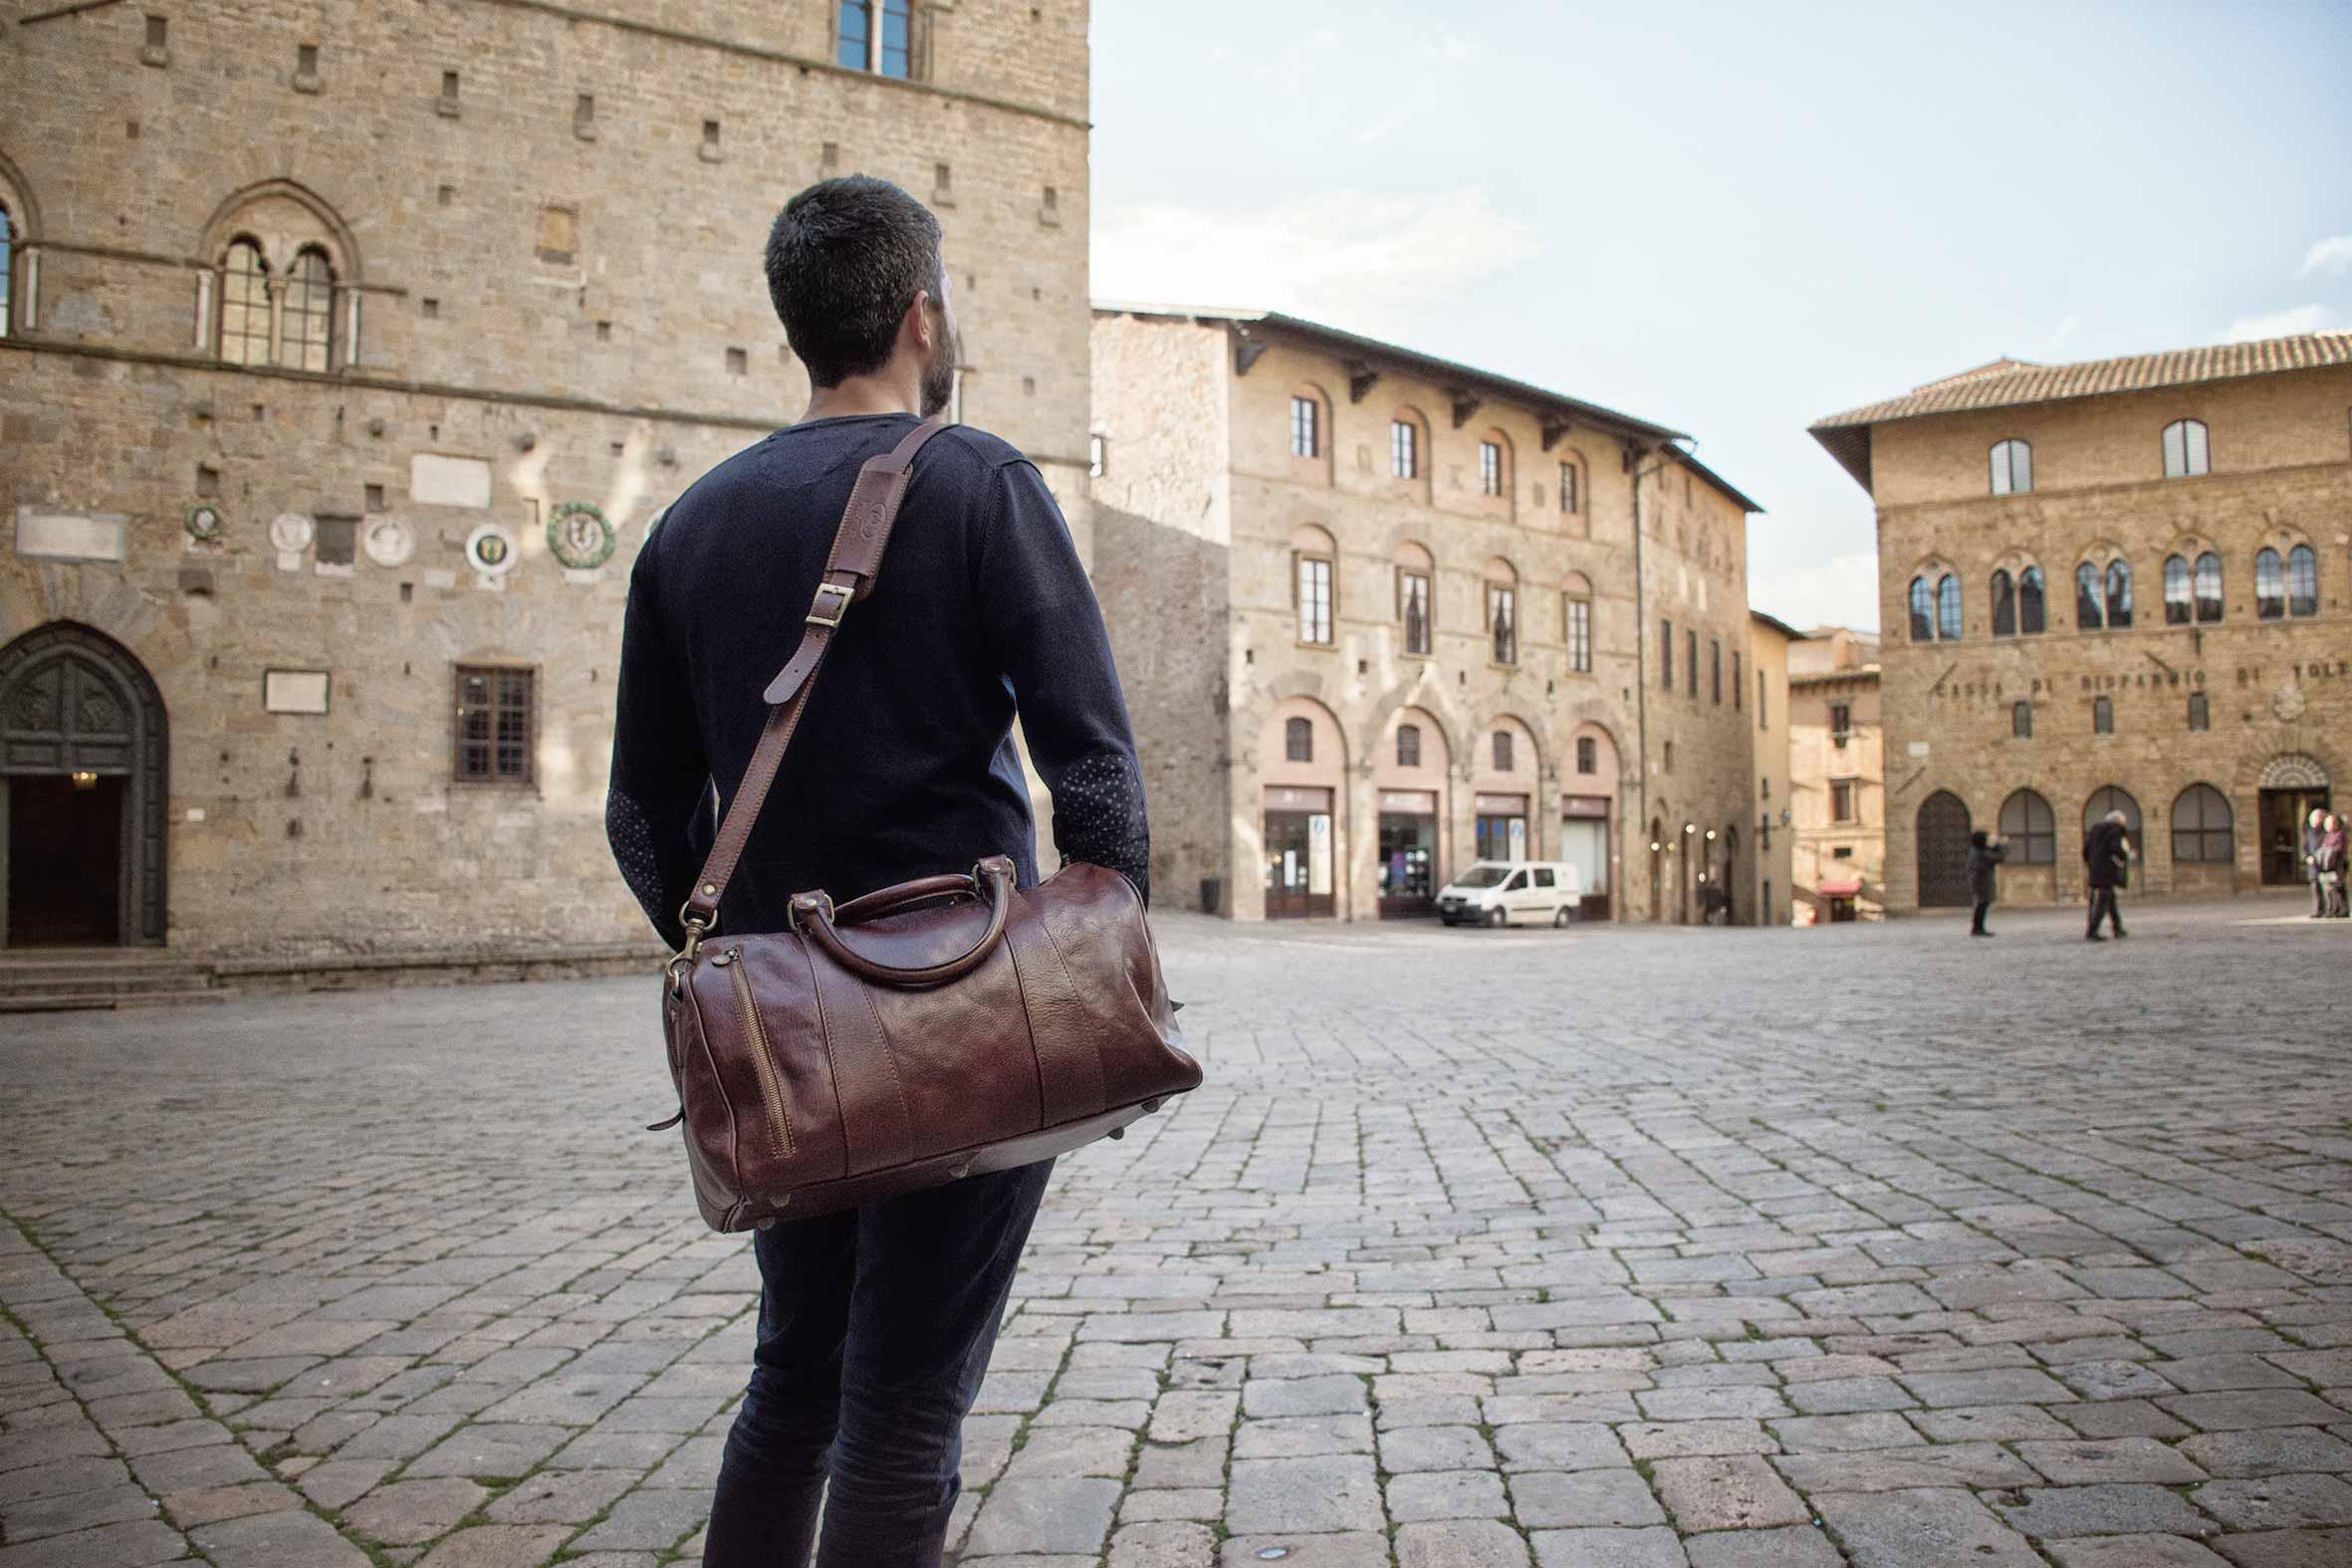 Borsa Michelangelo - Volterra